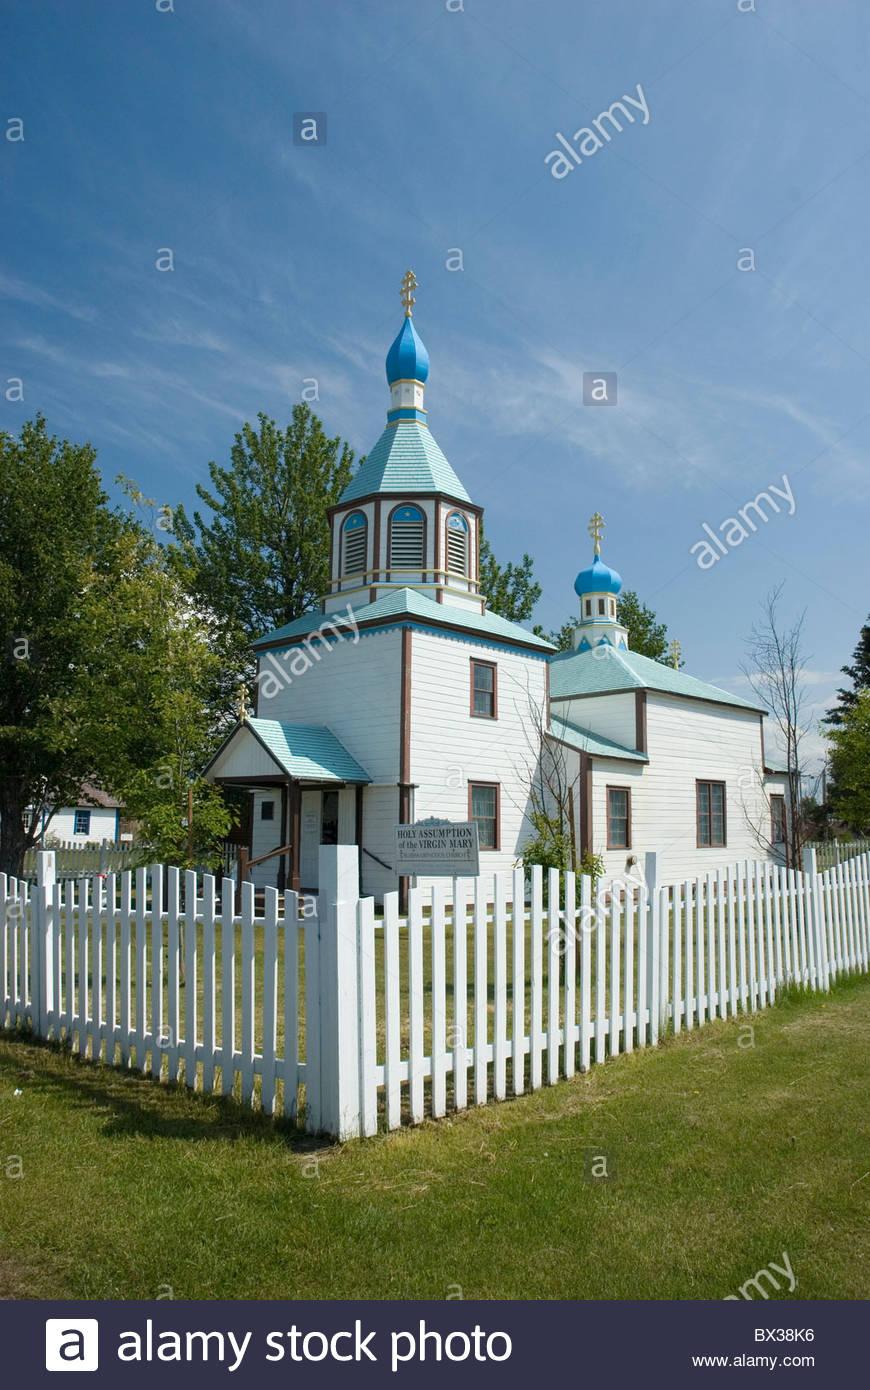 Accession à la Sainte Vierge Marie, l'Eglise orthodoxe russe, 1894-1895, Kenai, Alaska. Photo Stock